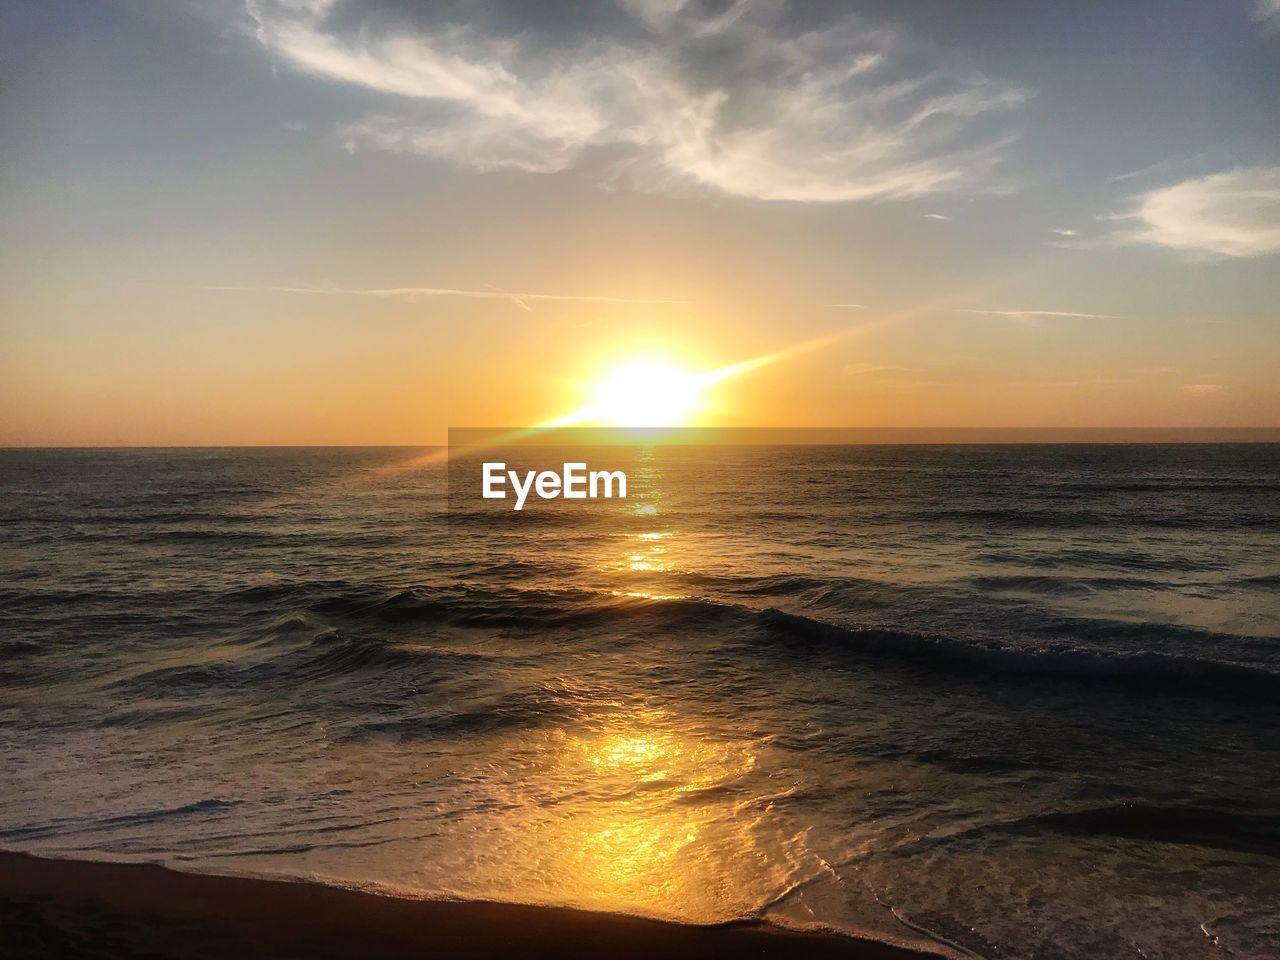 sky, sea, water, sunset, beauty in nature, scenics - nature, horizon, horizon over water, tranquility, beach, land, sun, cloud - sky, tranquil scene, idyllic, sunlight, nature, wave, non-urban scene, outdoors, no people